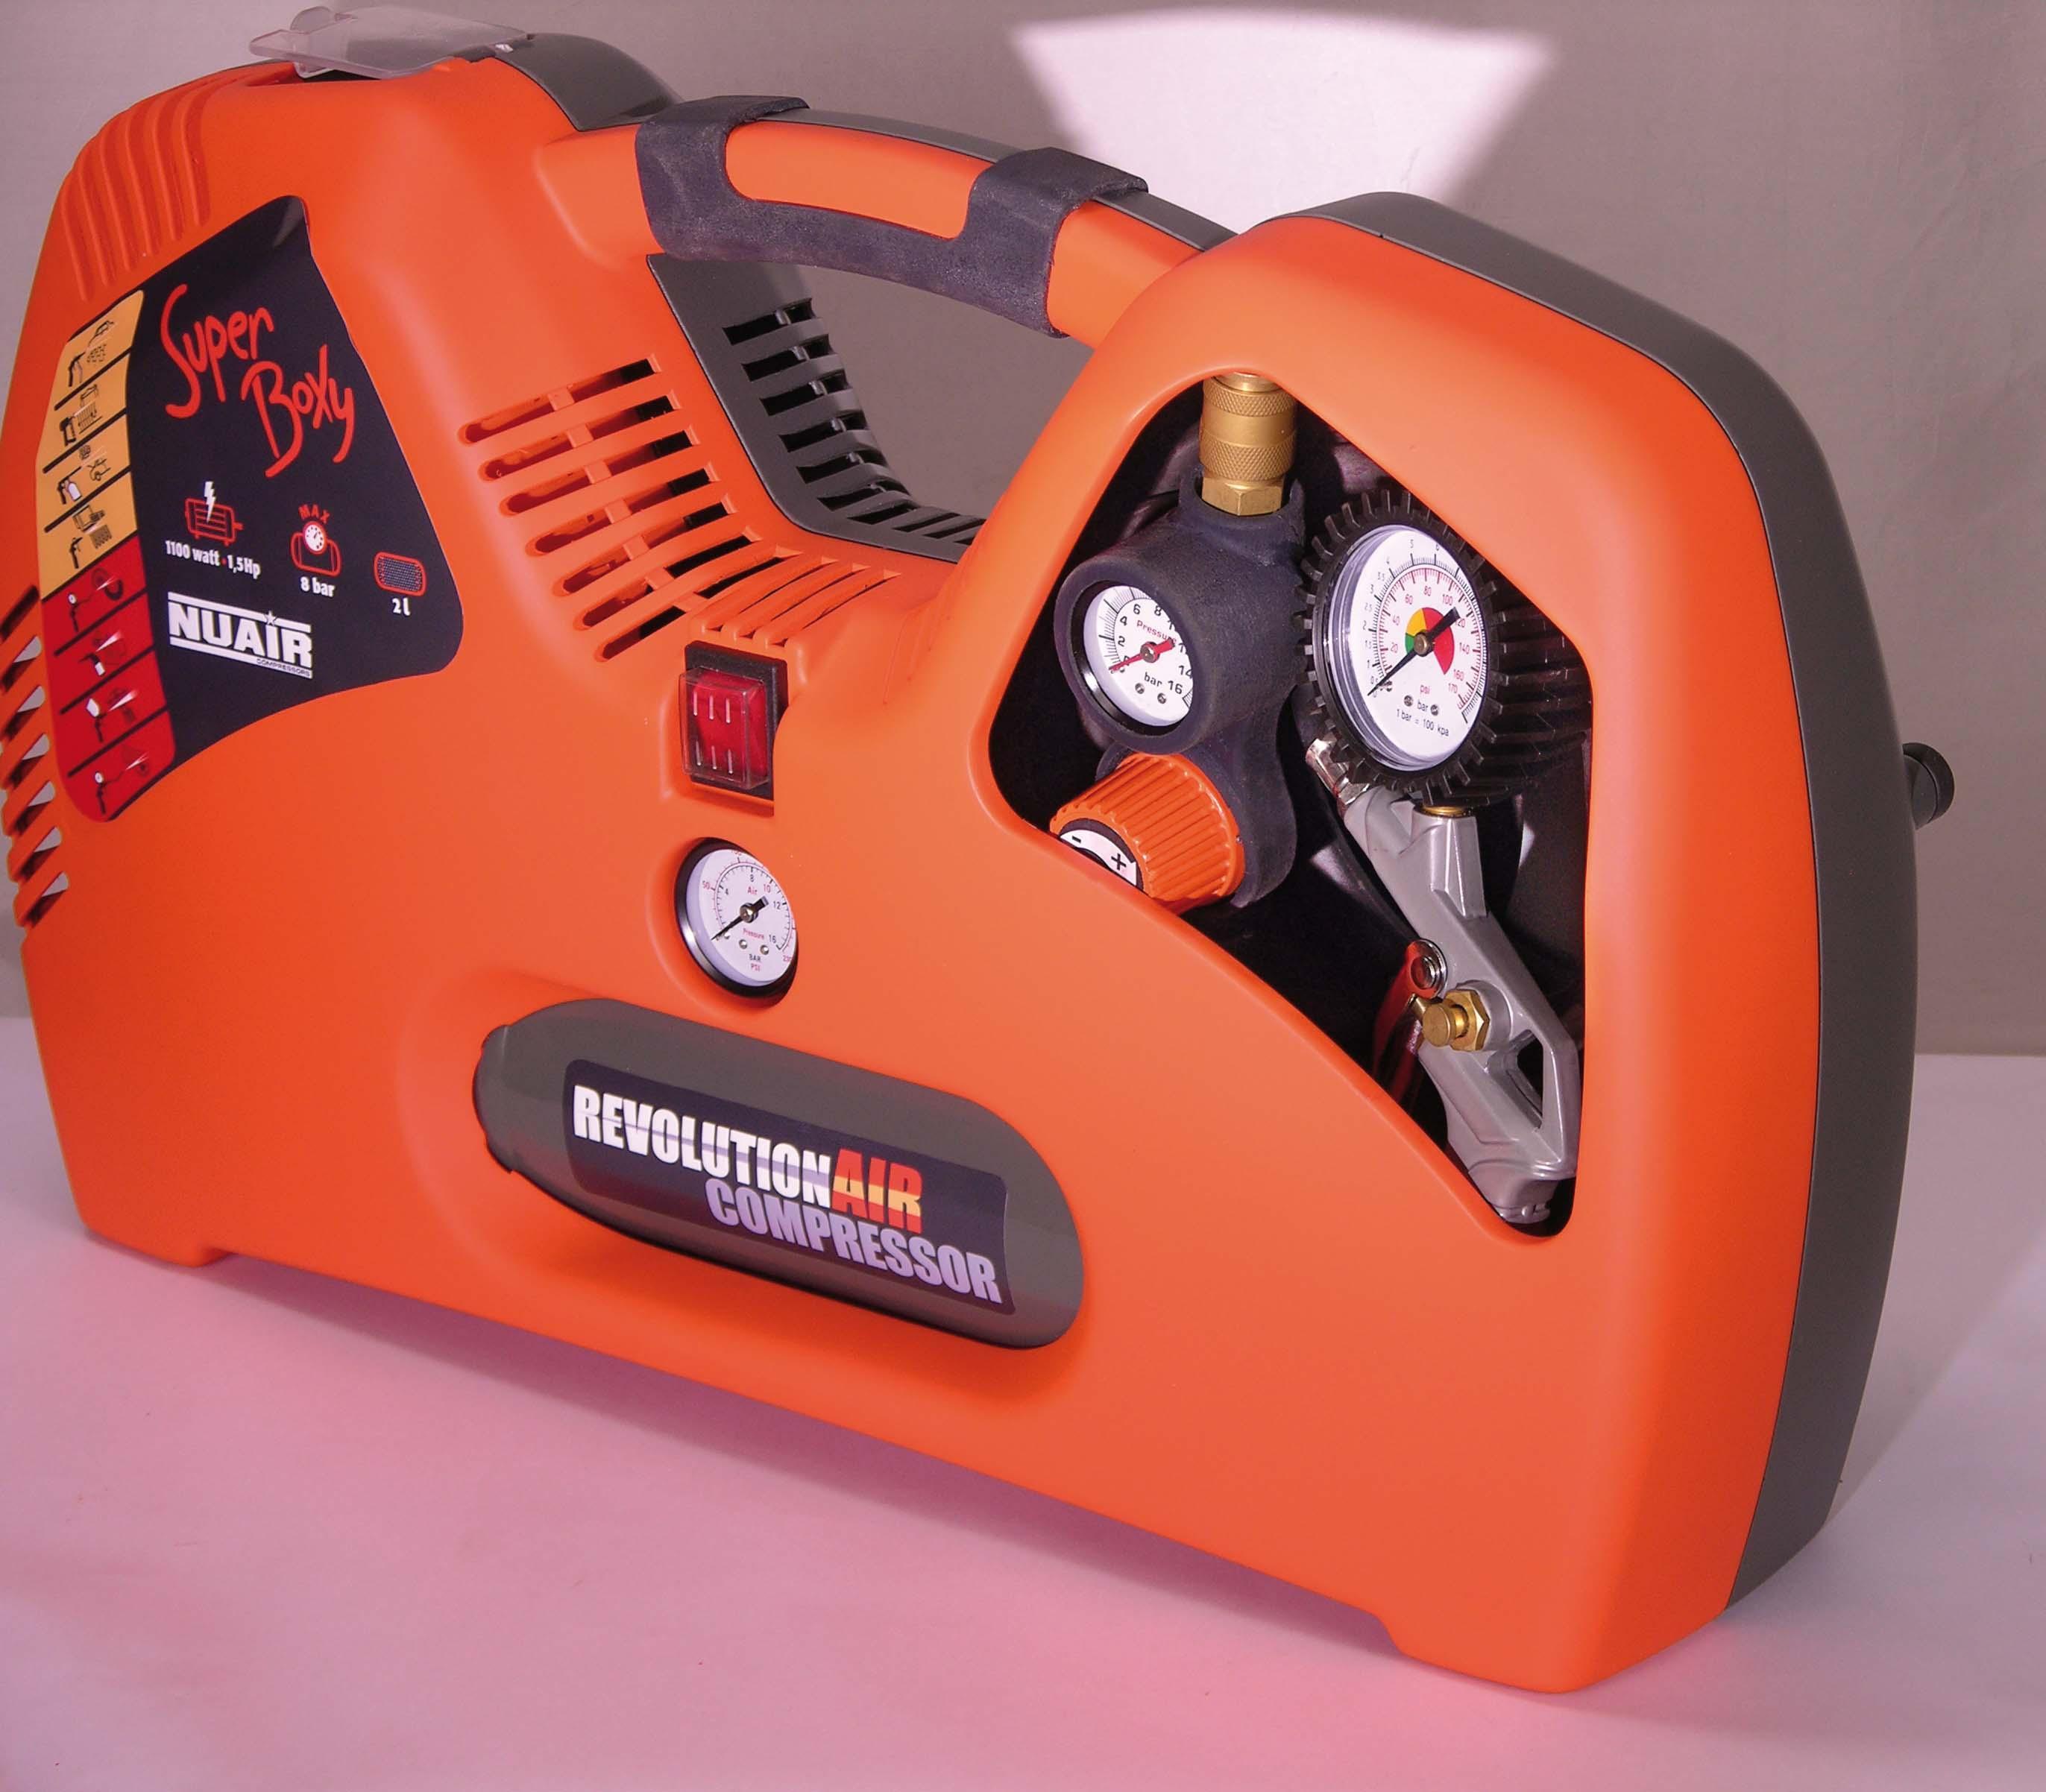 RevolutionAir Super Boxy Superboxy Compresseur dp BHSAQ